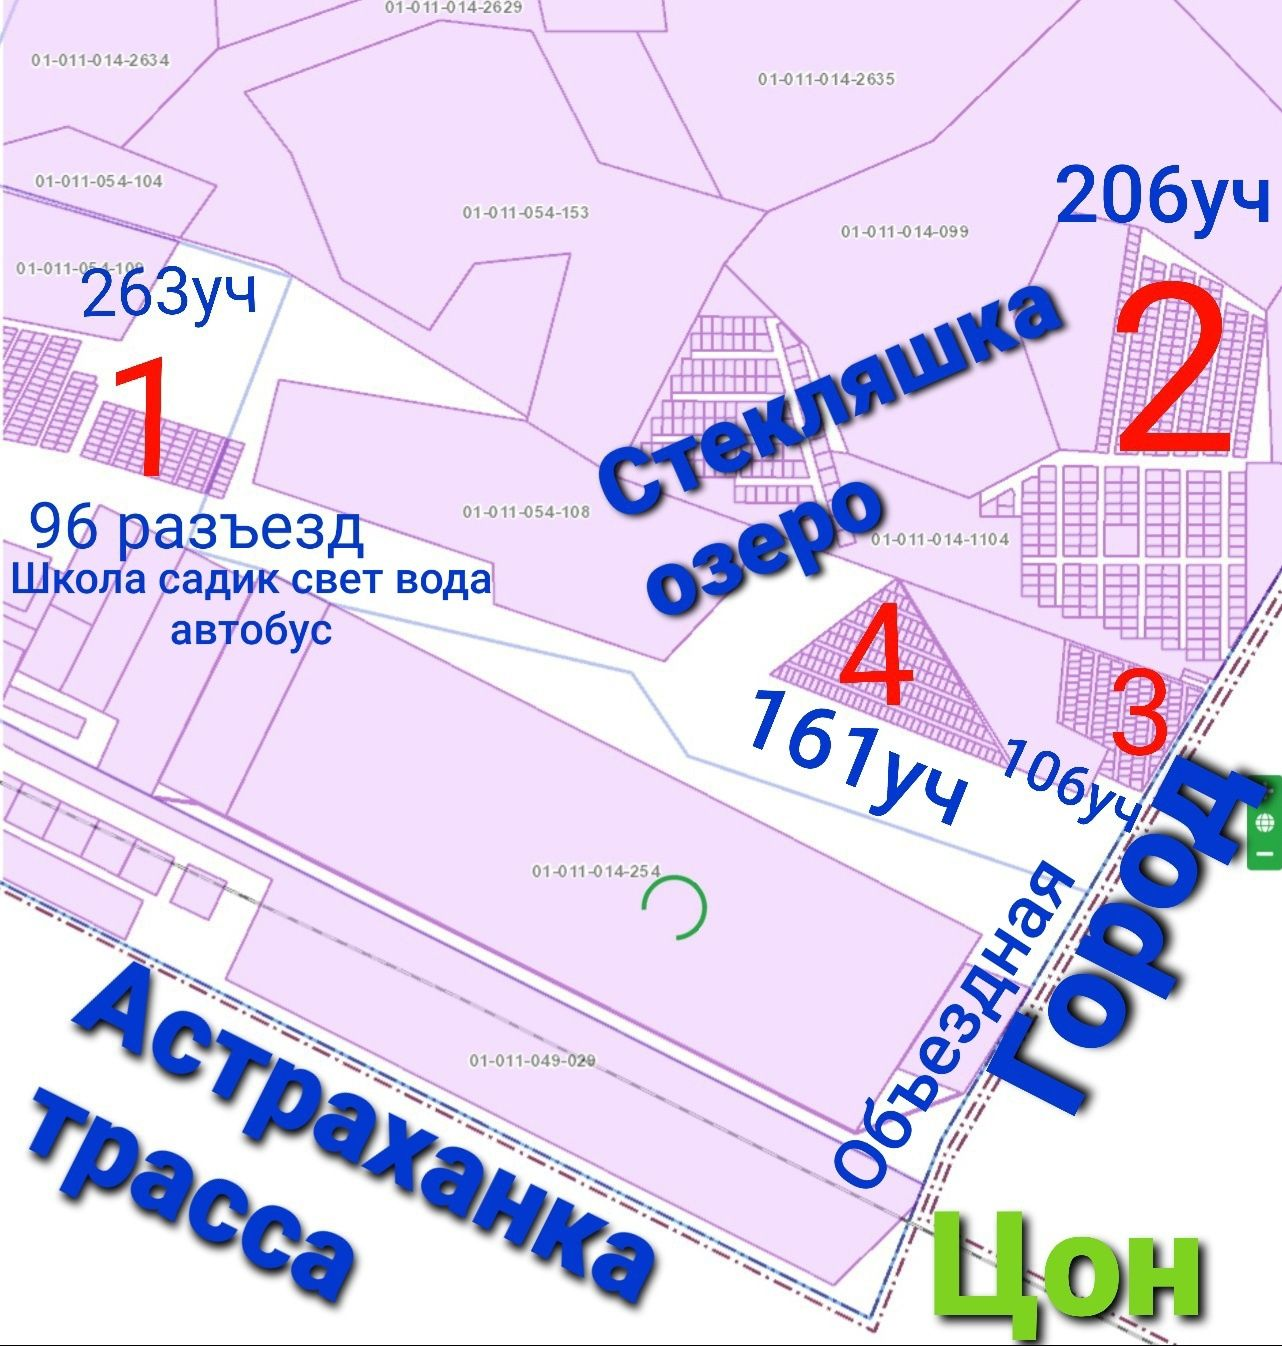 Участок земля Астана Нур-Султан 96 разъезд Ыбрай Алтынсарина